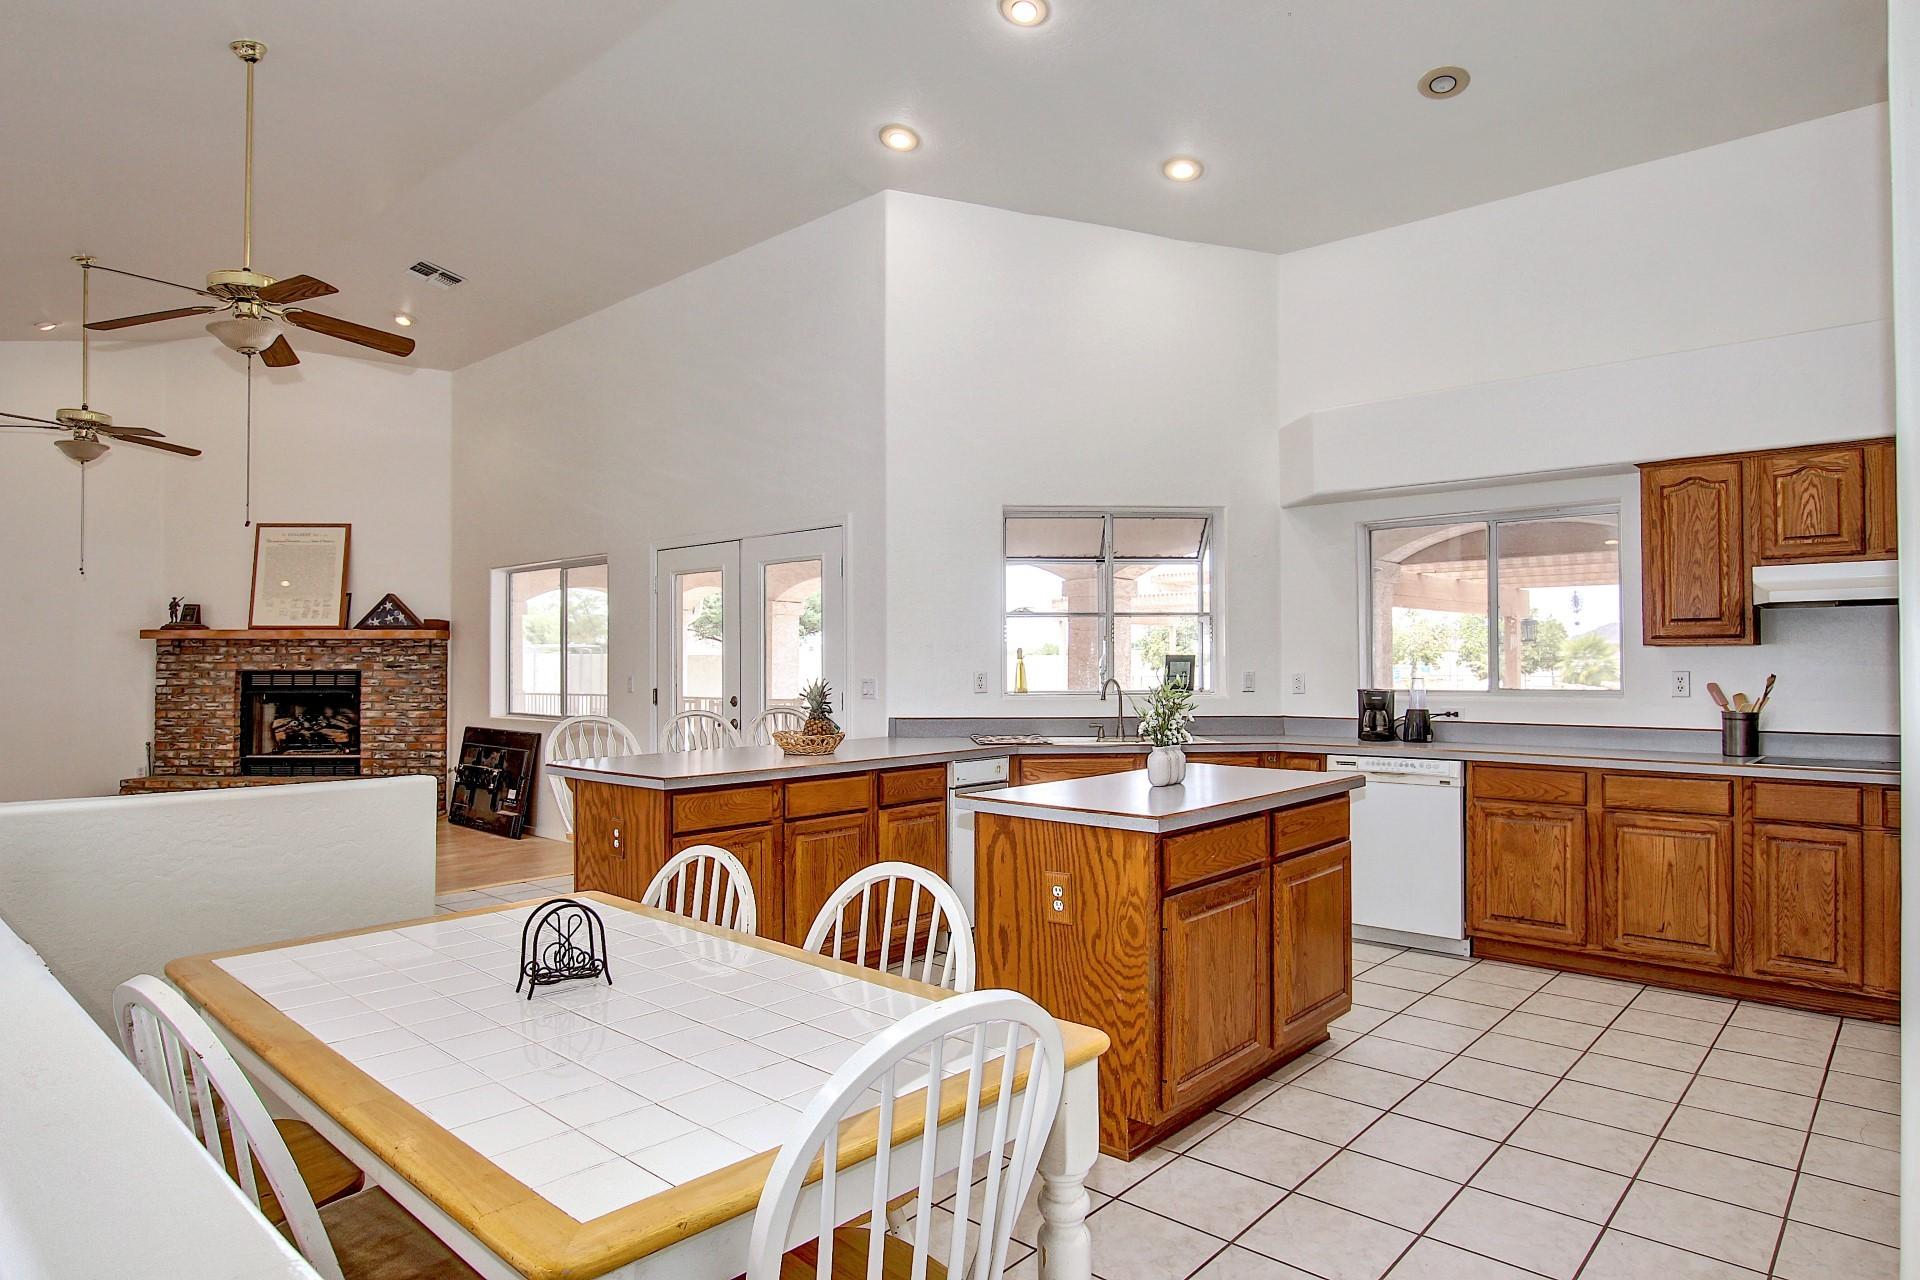 North Peoria Az Custom Home For Sale Andrew Robb Re